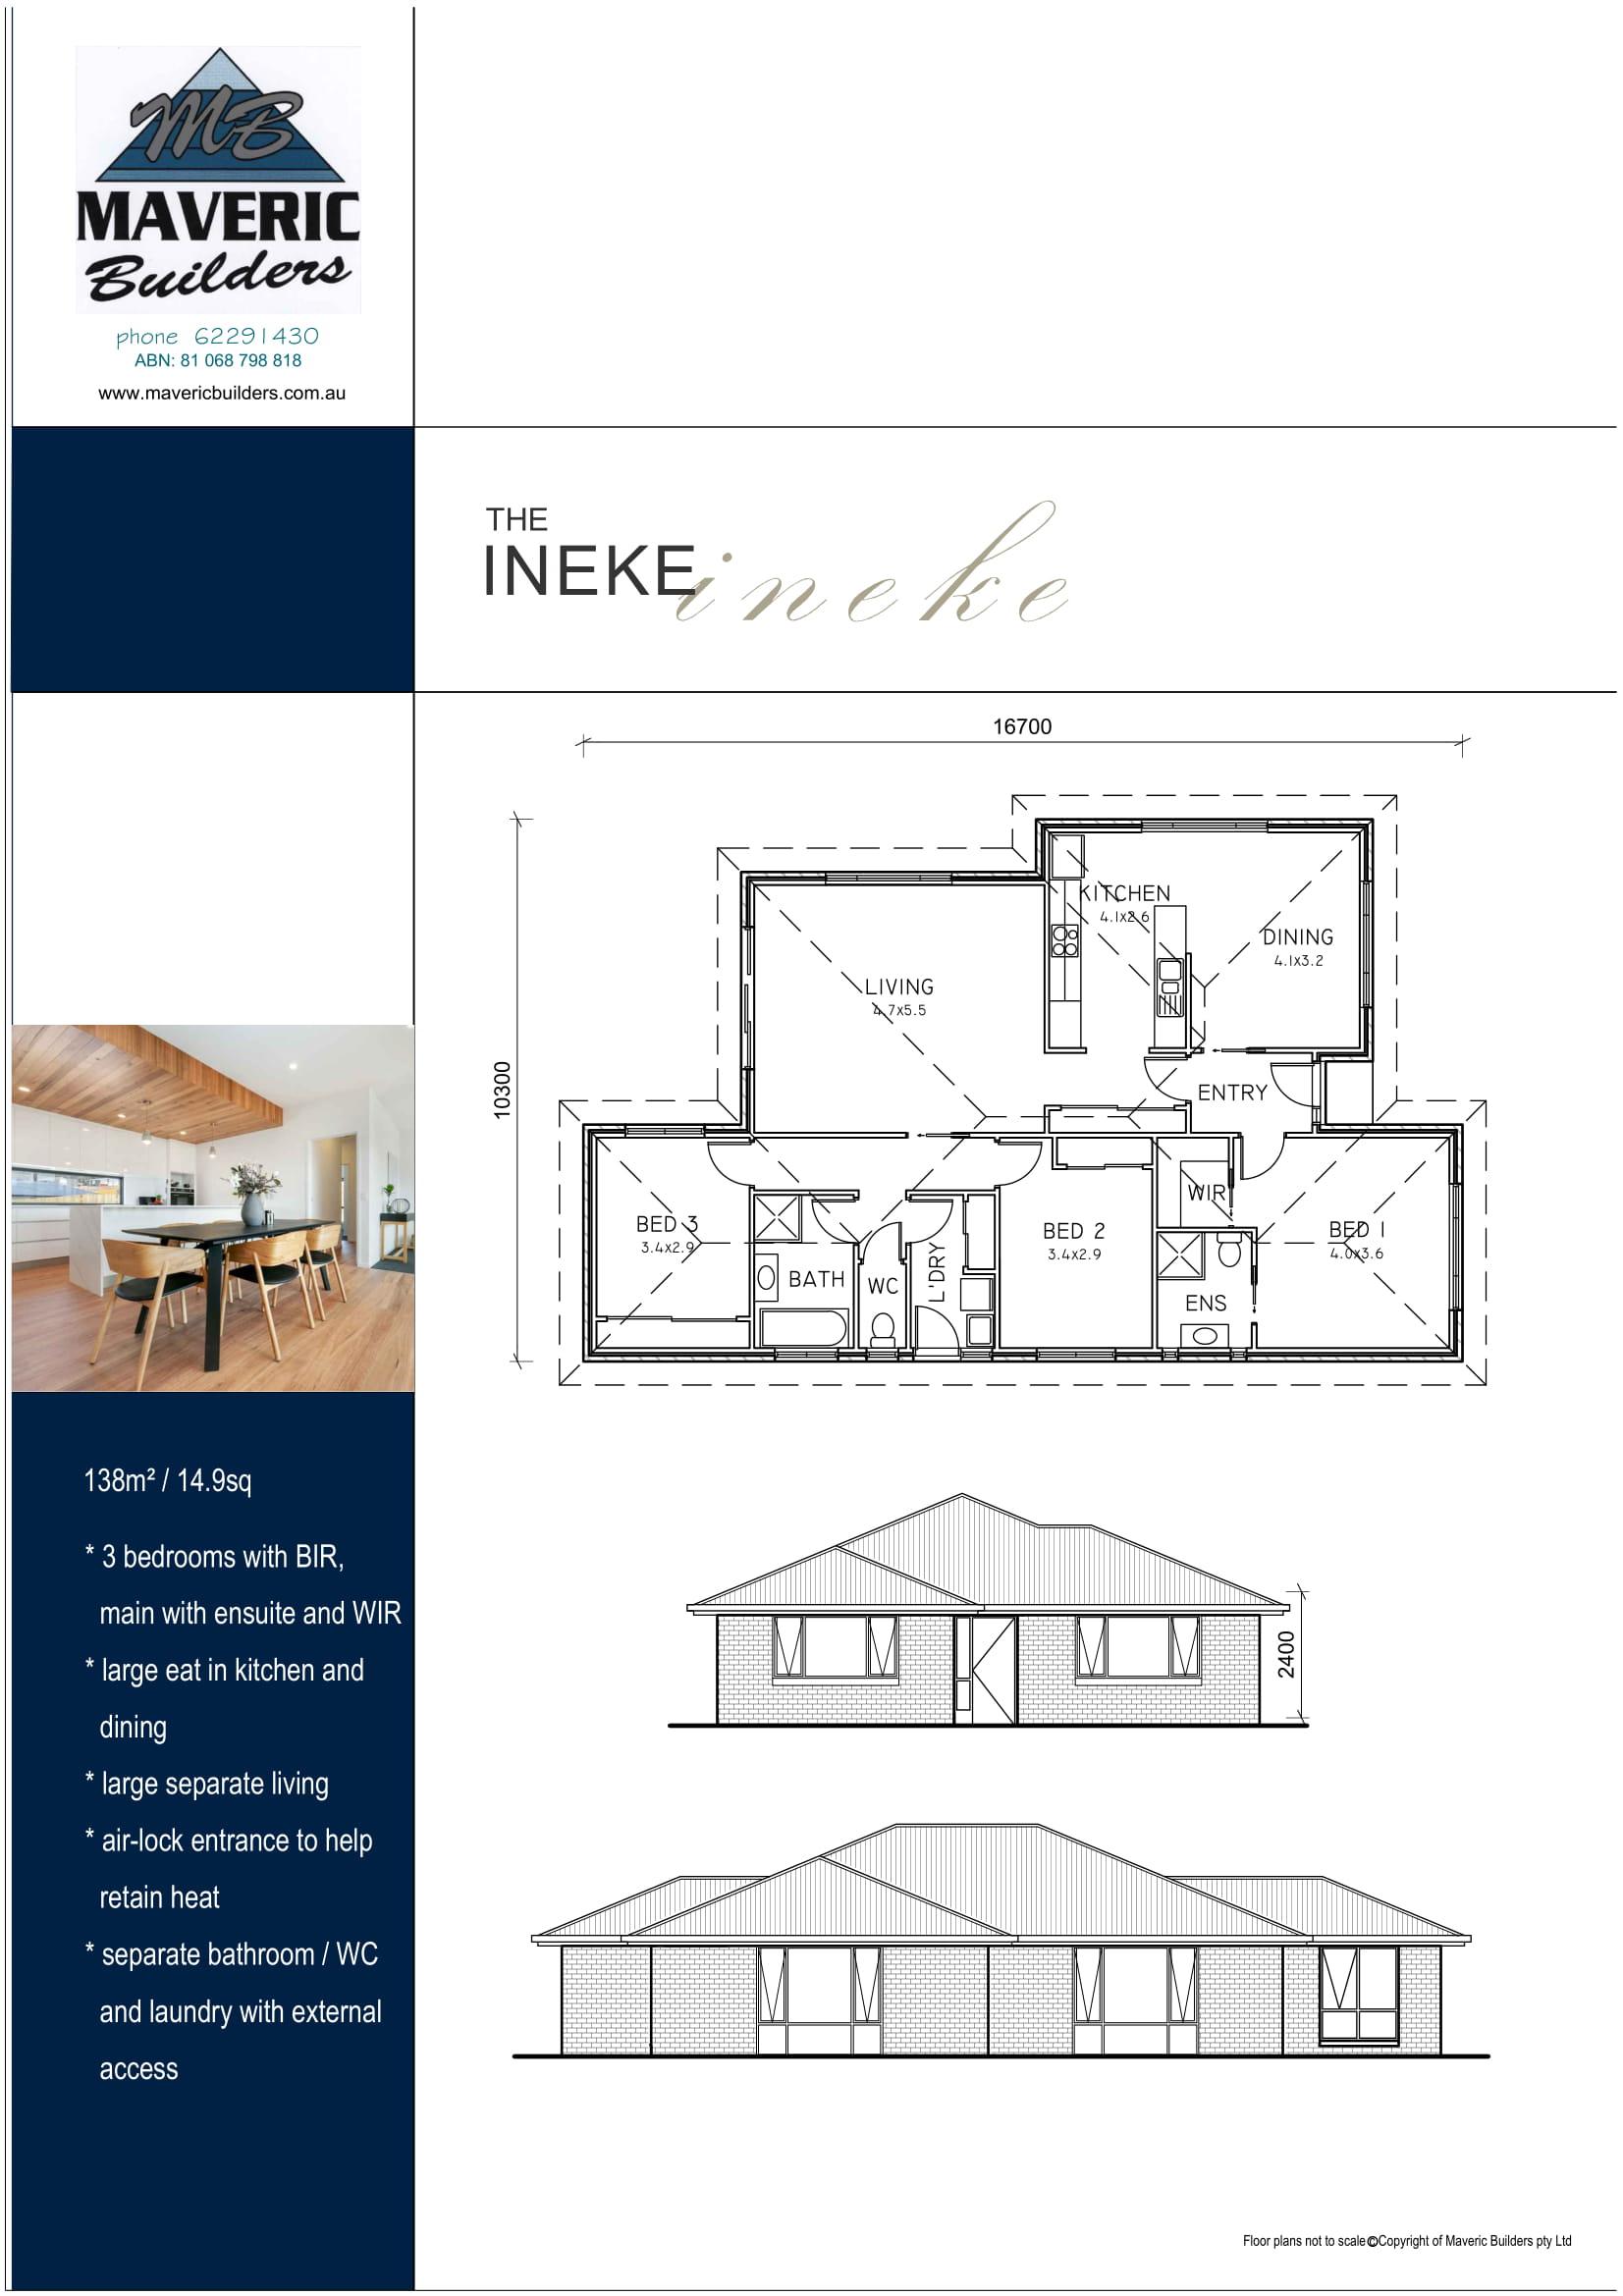 A4 Brochures 2019 01 - 24-11.jpg